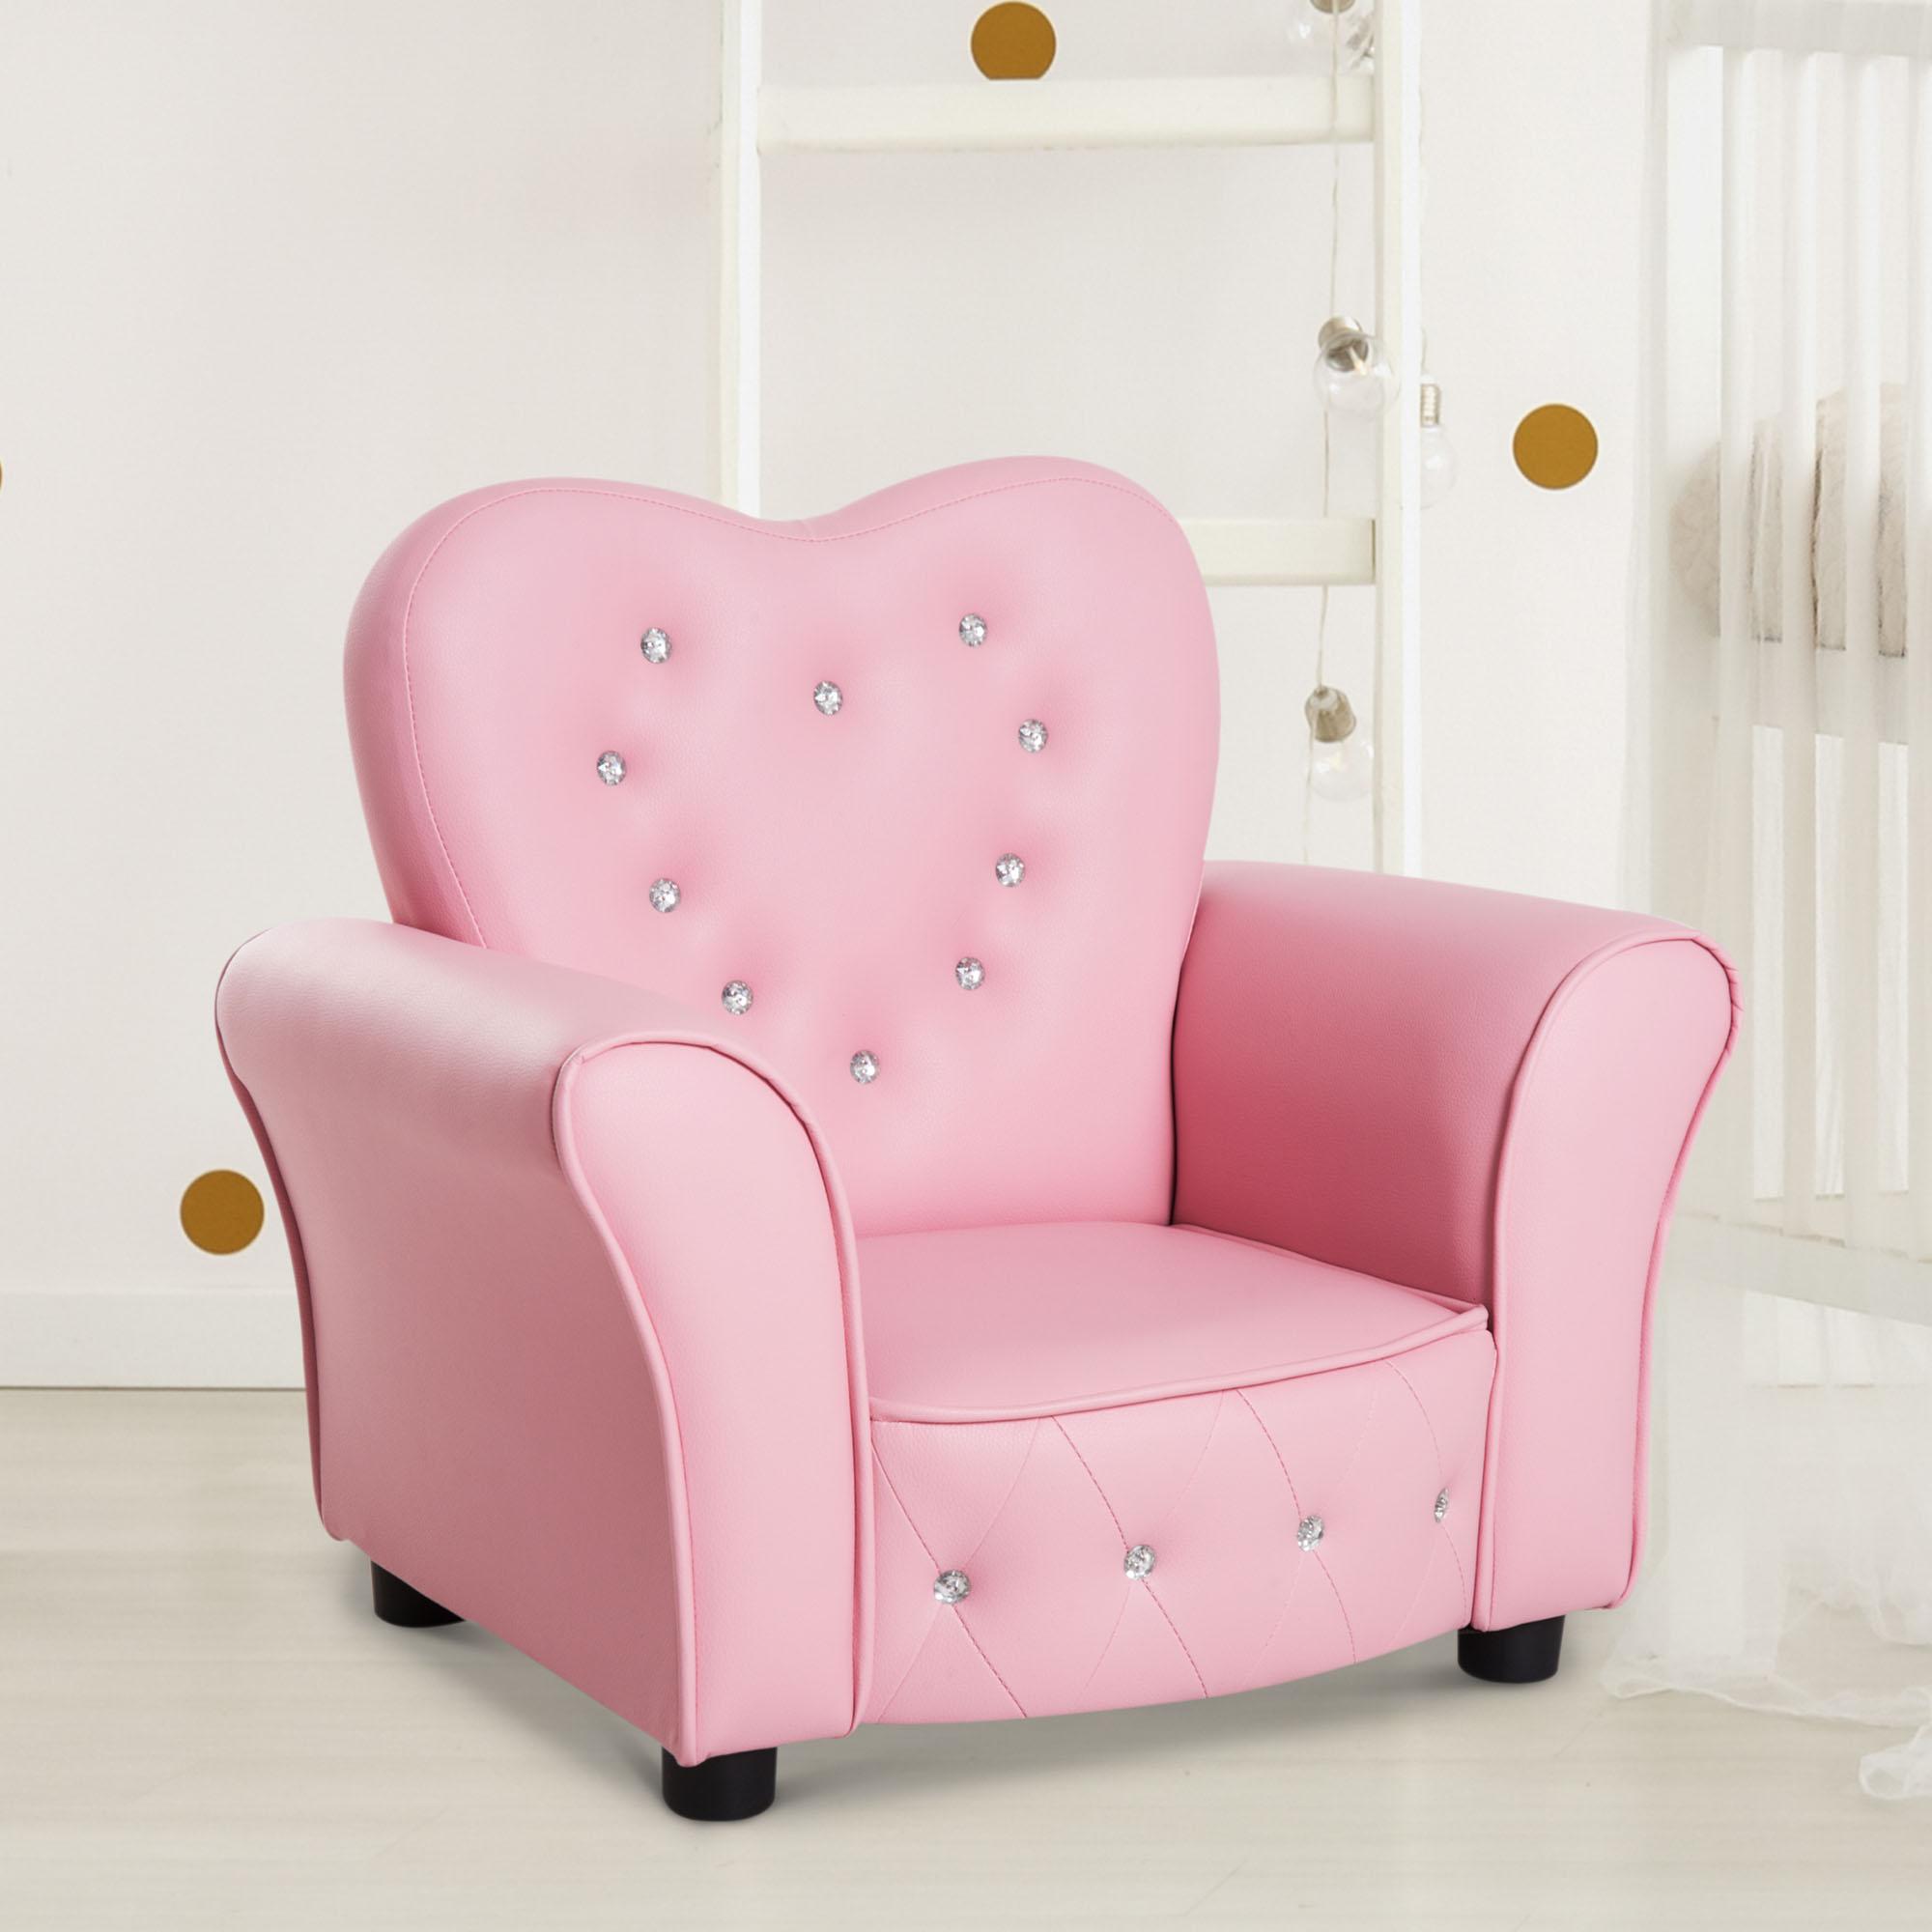 Picture of: Kid Teen Sofa Armrest Chair Couch Children Toddler Birthday Gift Girls Pink 842525125826 Ebay